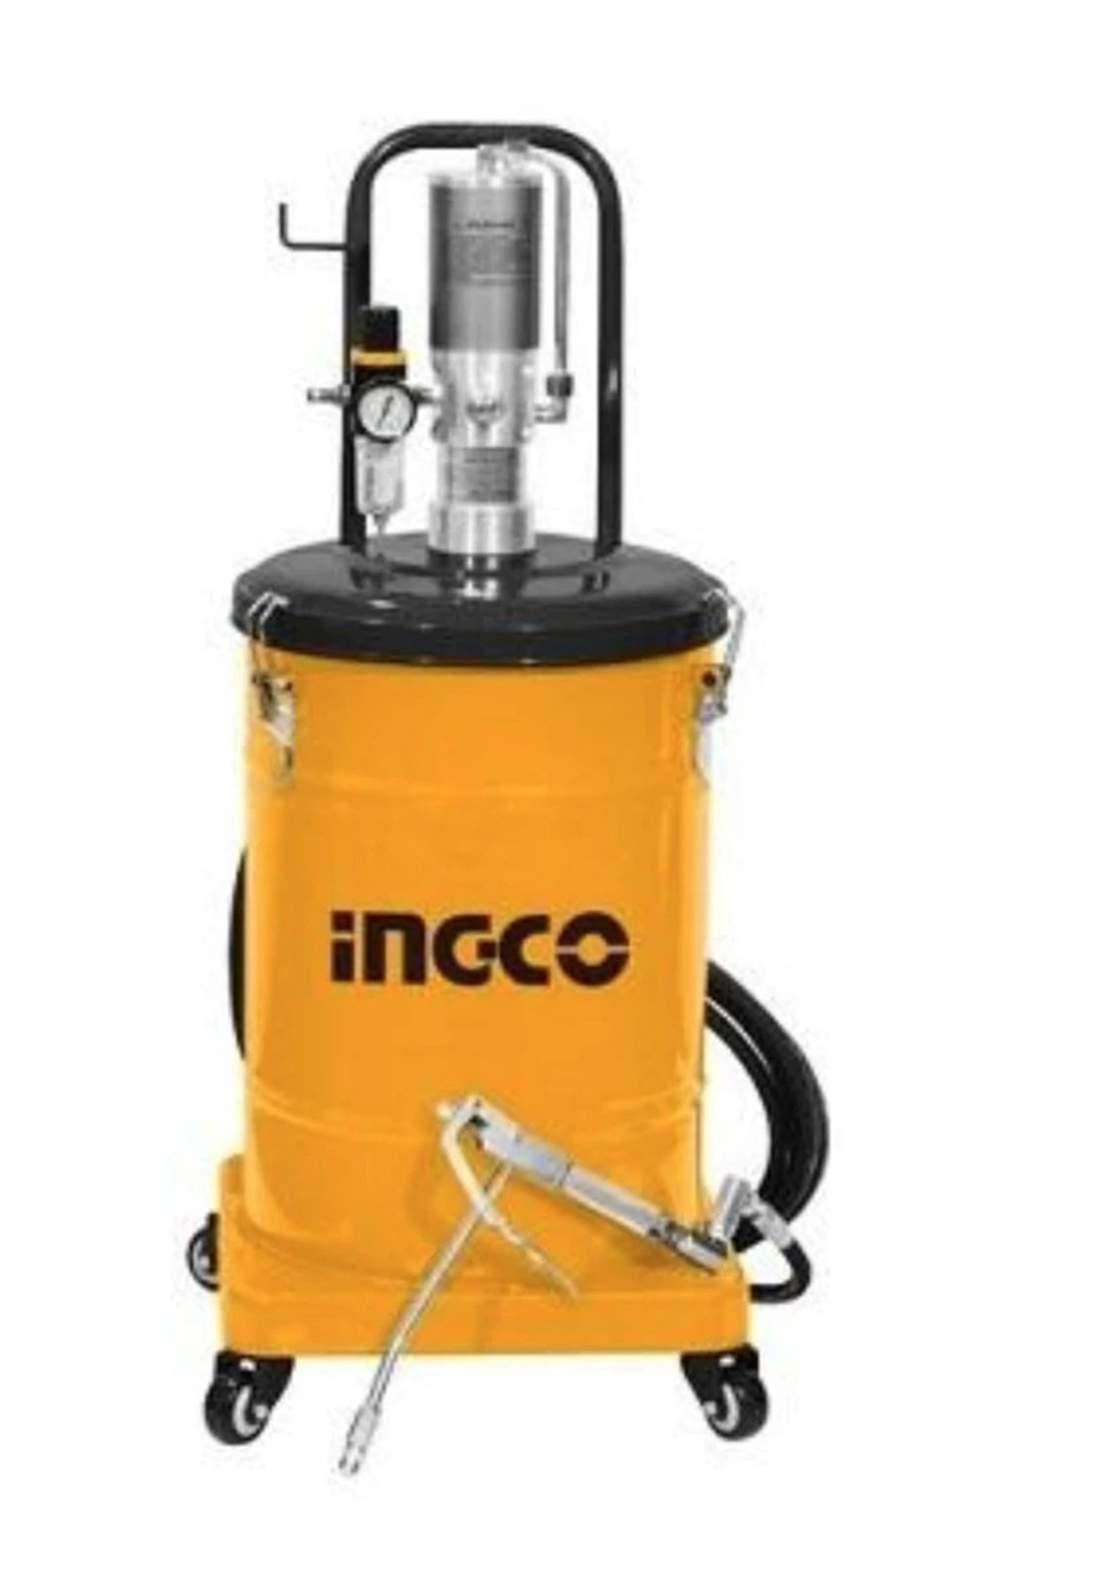 Ingco AGL01301 Air Grease Lubricator 30 Liters تشحيم دهن هيدروليك